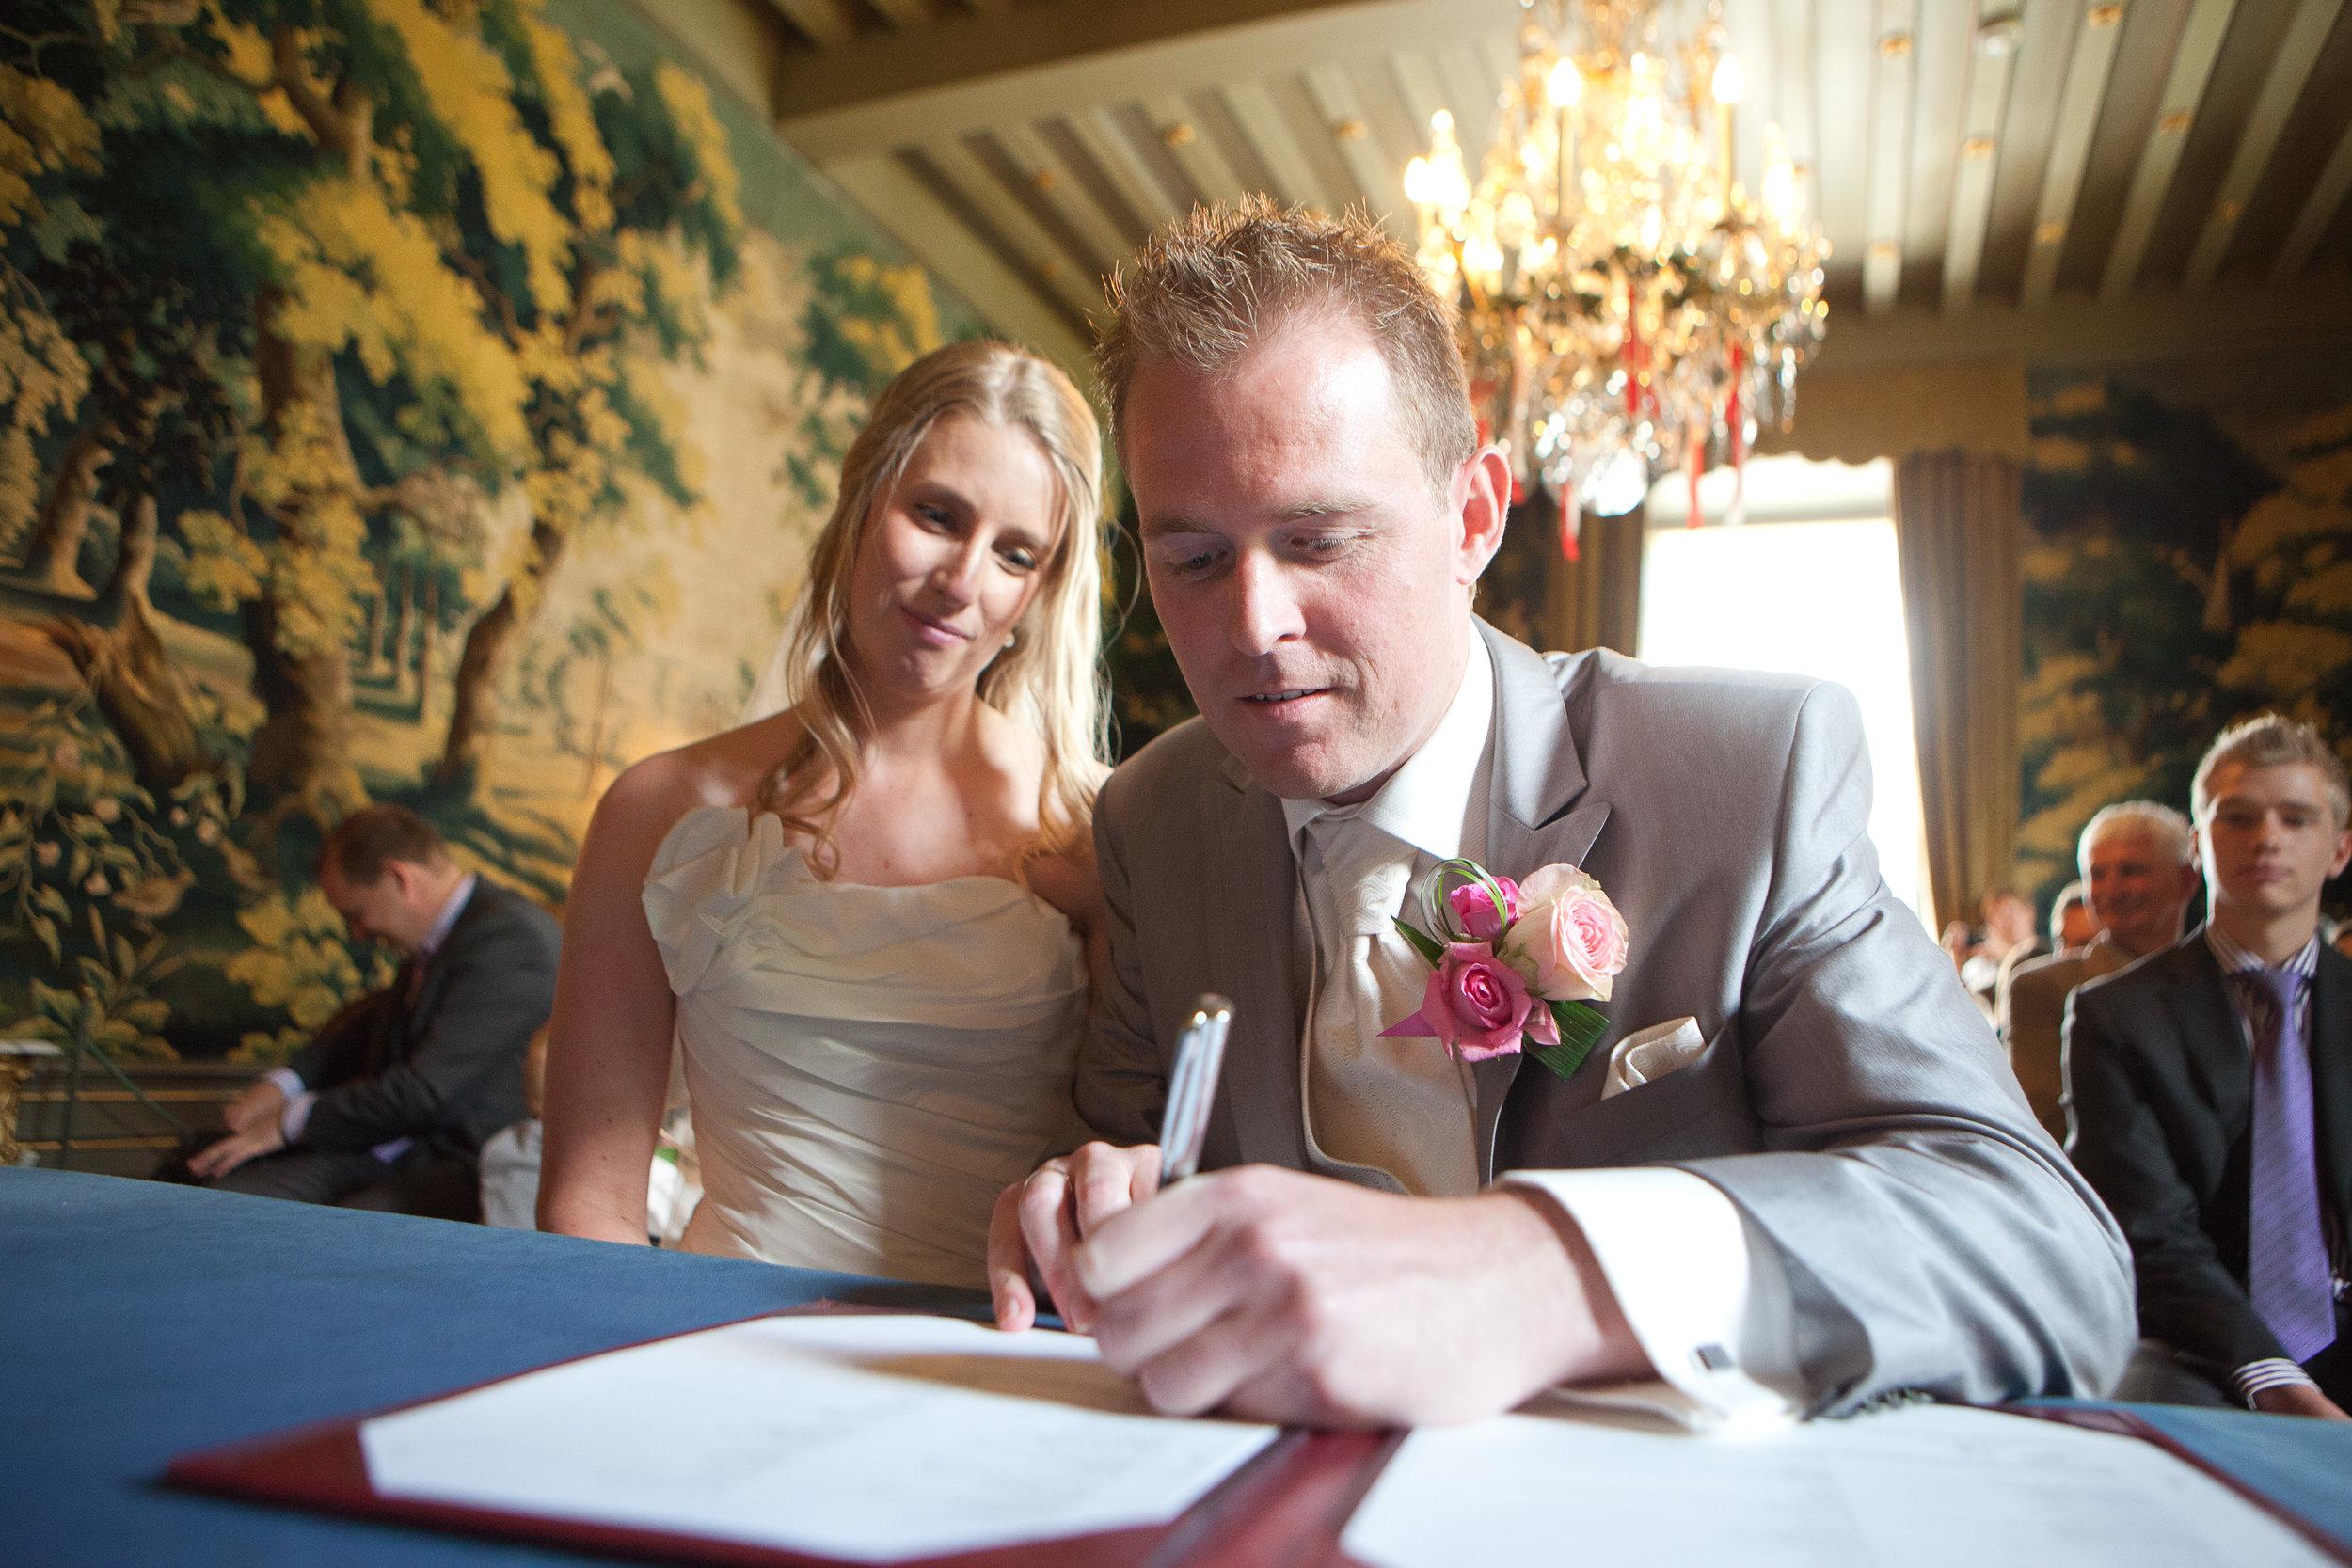 trouwshoot-bruidsfotografie-trouwfoto-feestfotografie-trouwreportage-Jan en Loes589.jpg